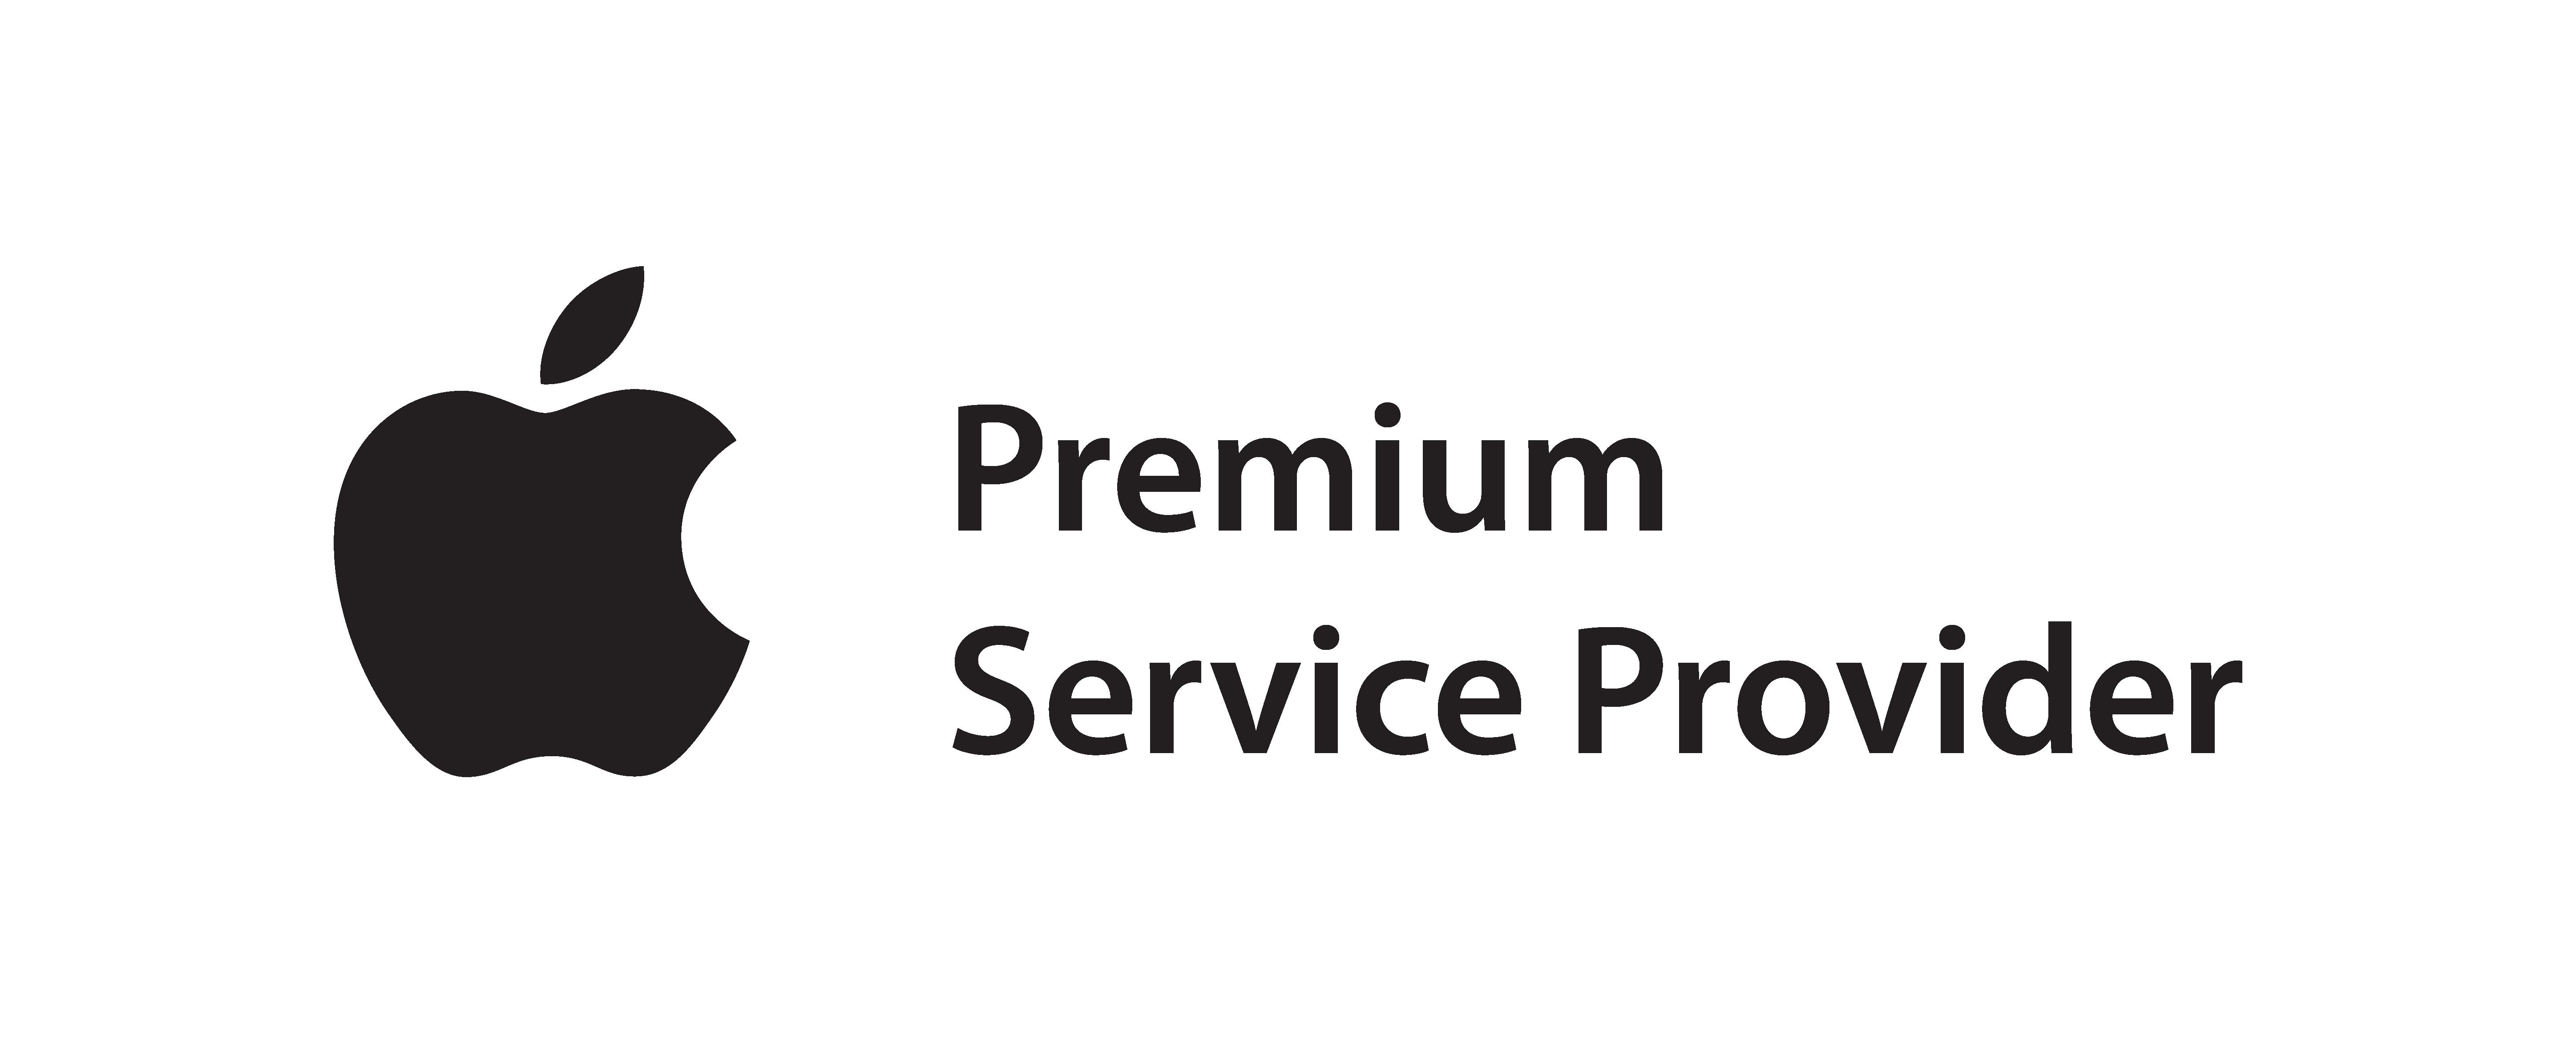 Premium Service Provider